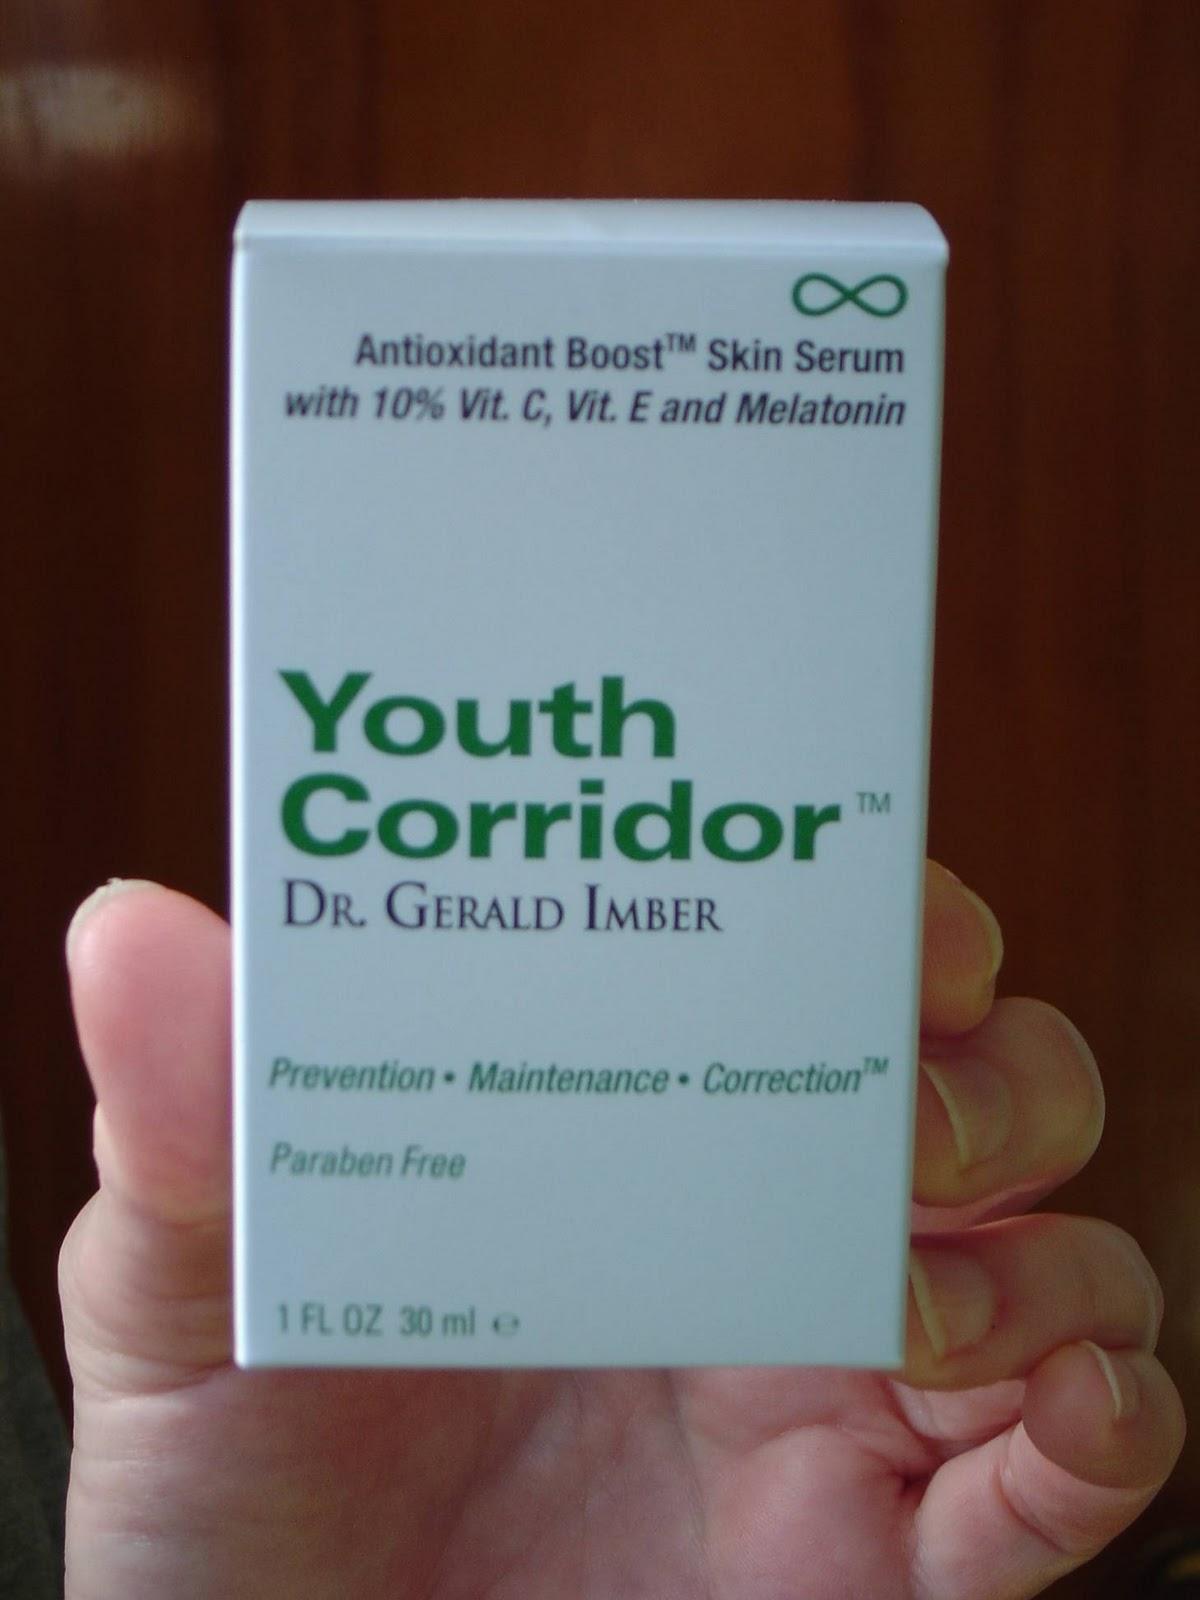 Youth Corridor Antioxidant Boost Skin Serum